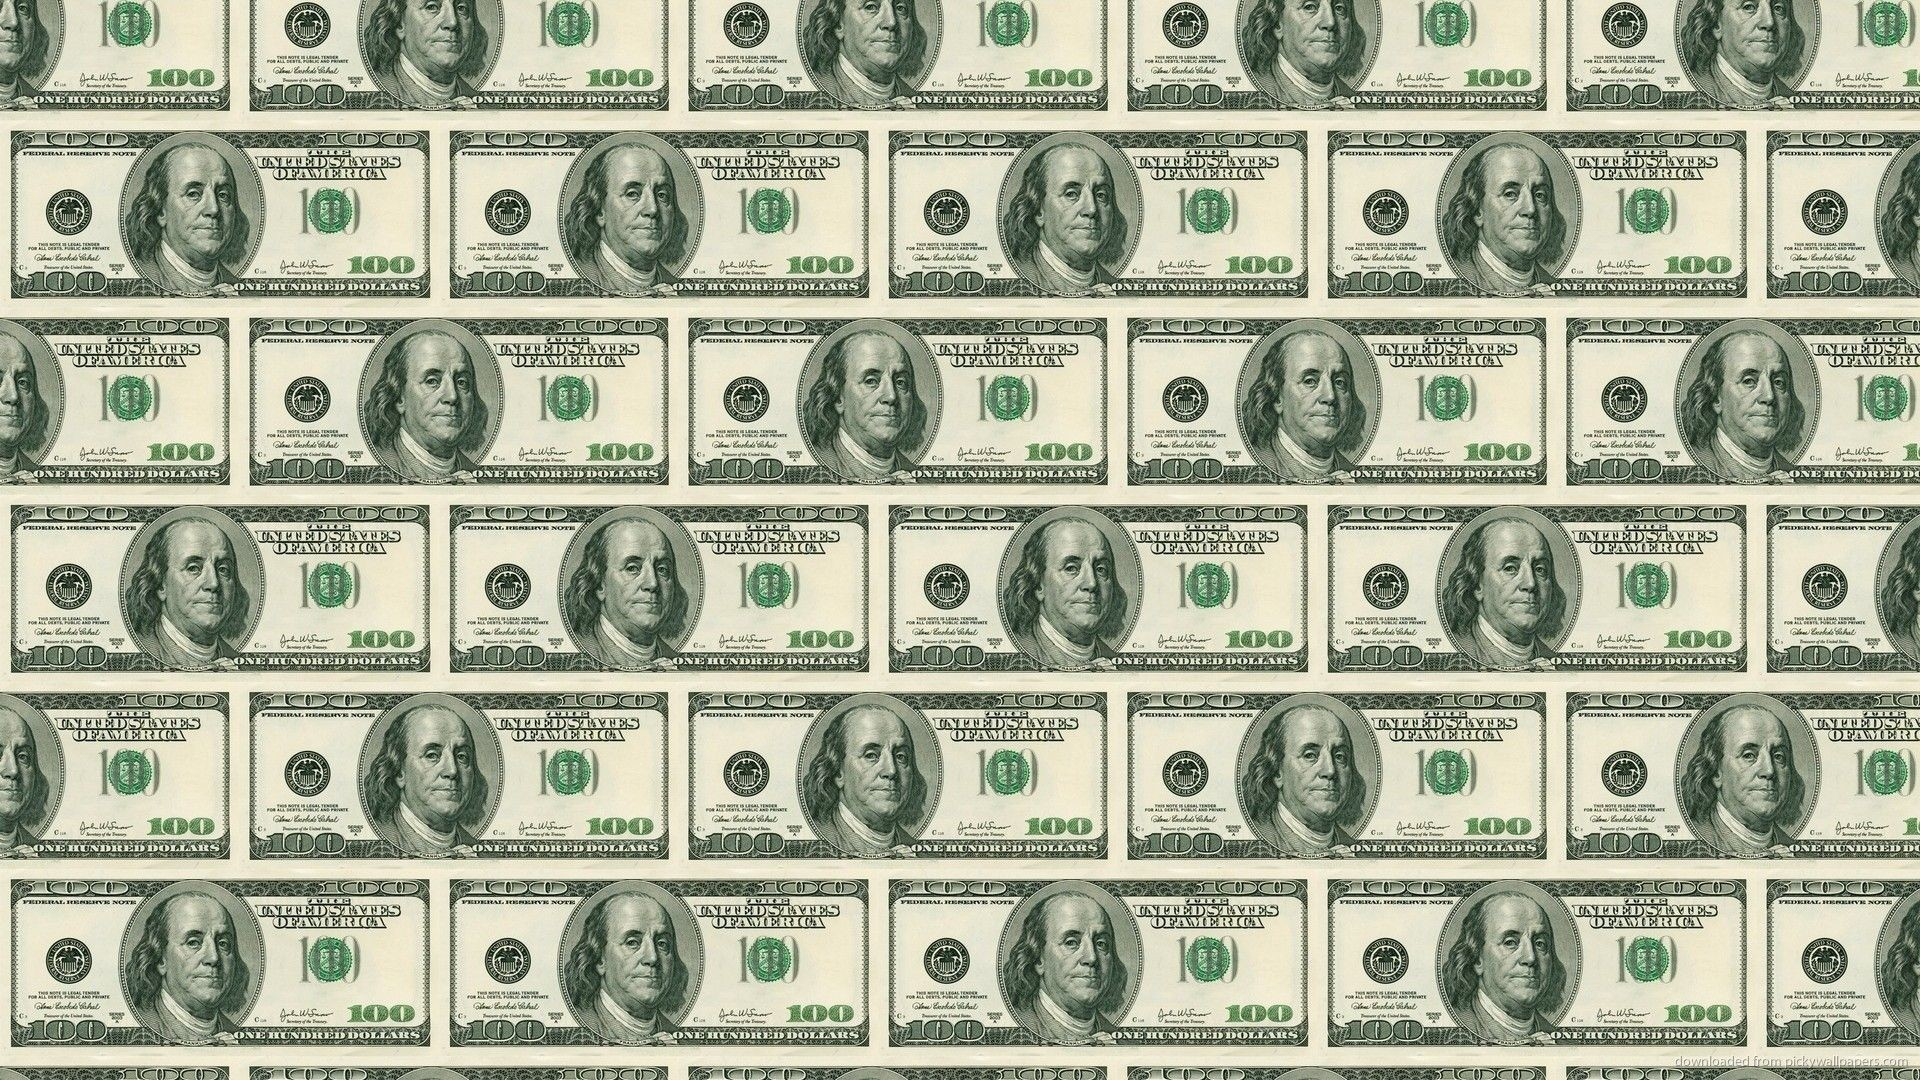 100 Dollar Bill Pattern Wallpaper For iPhone 4